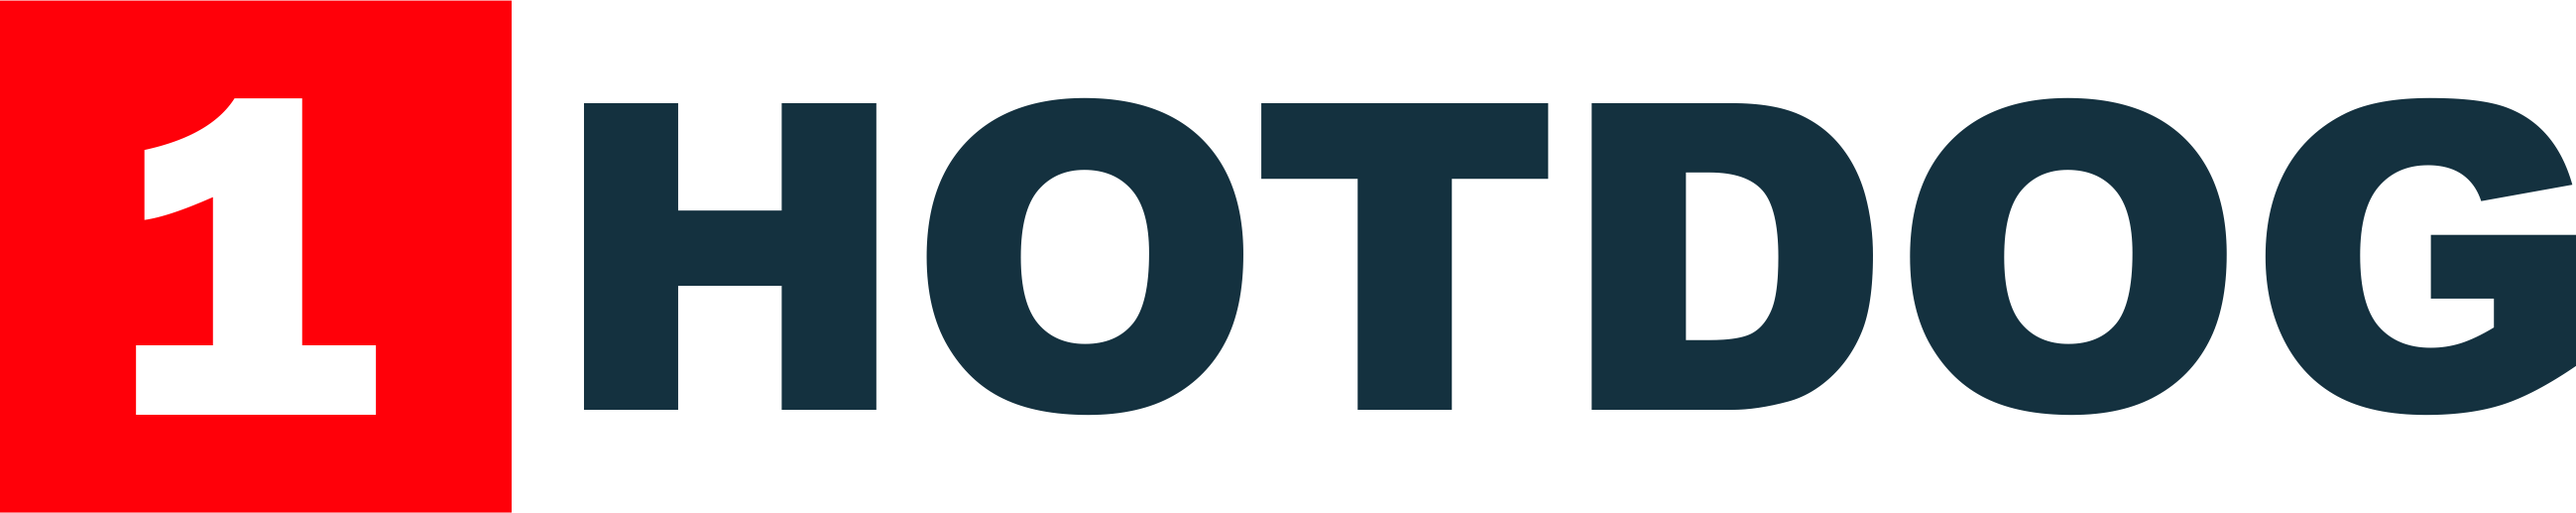 1HOTDOG